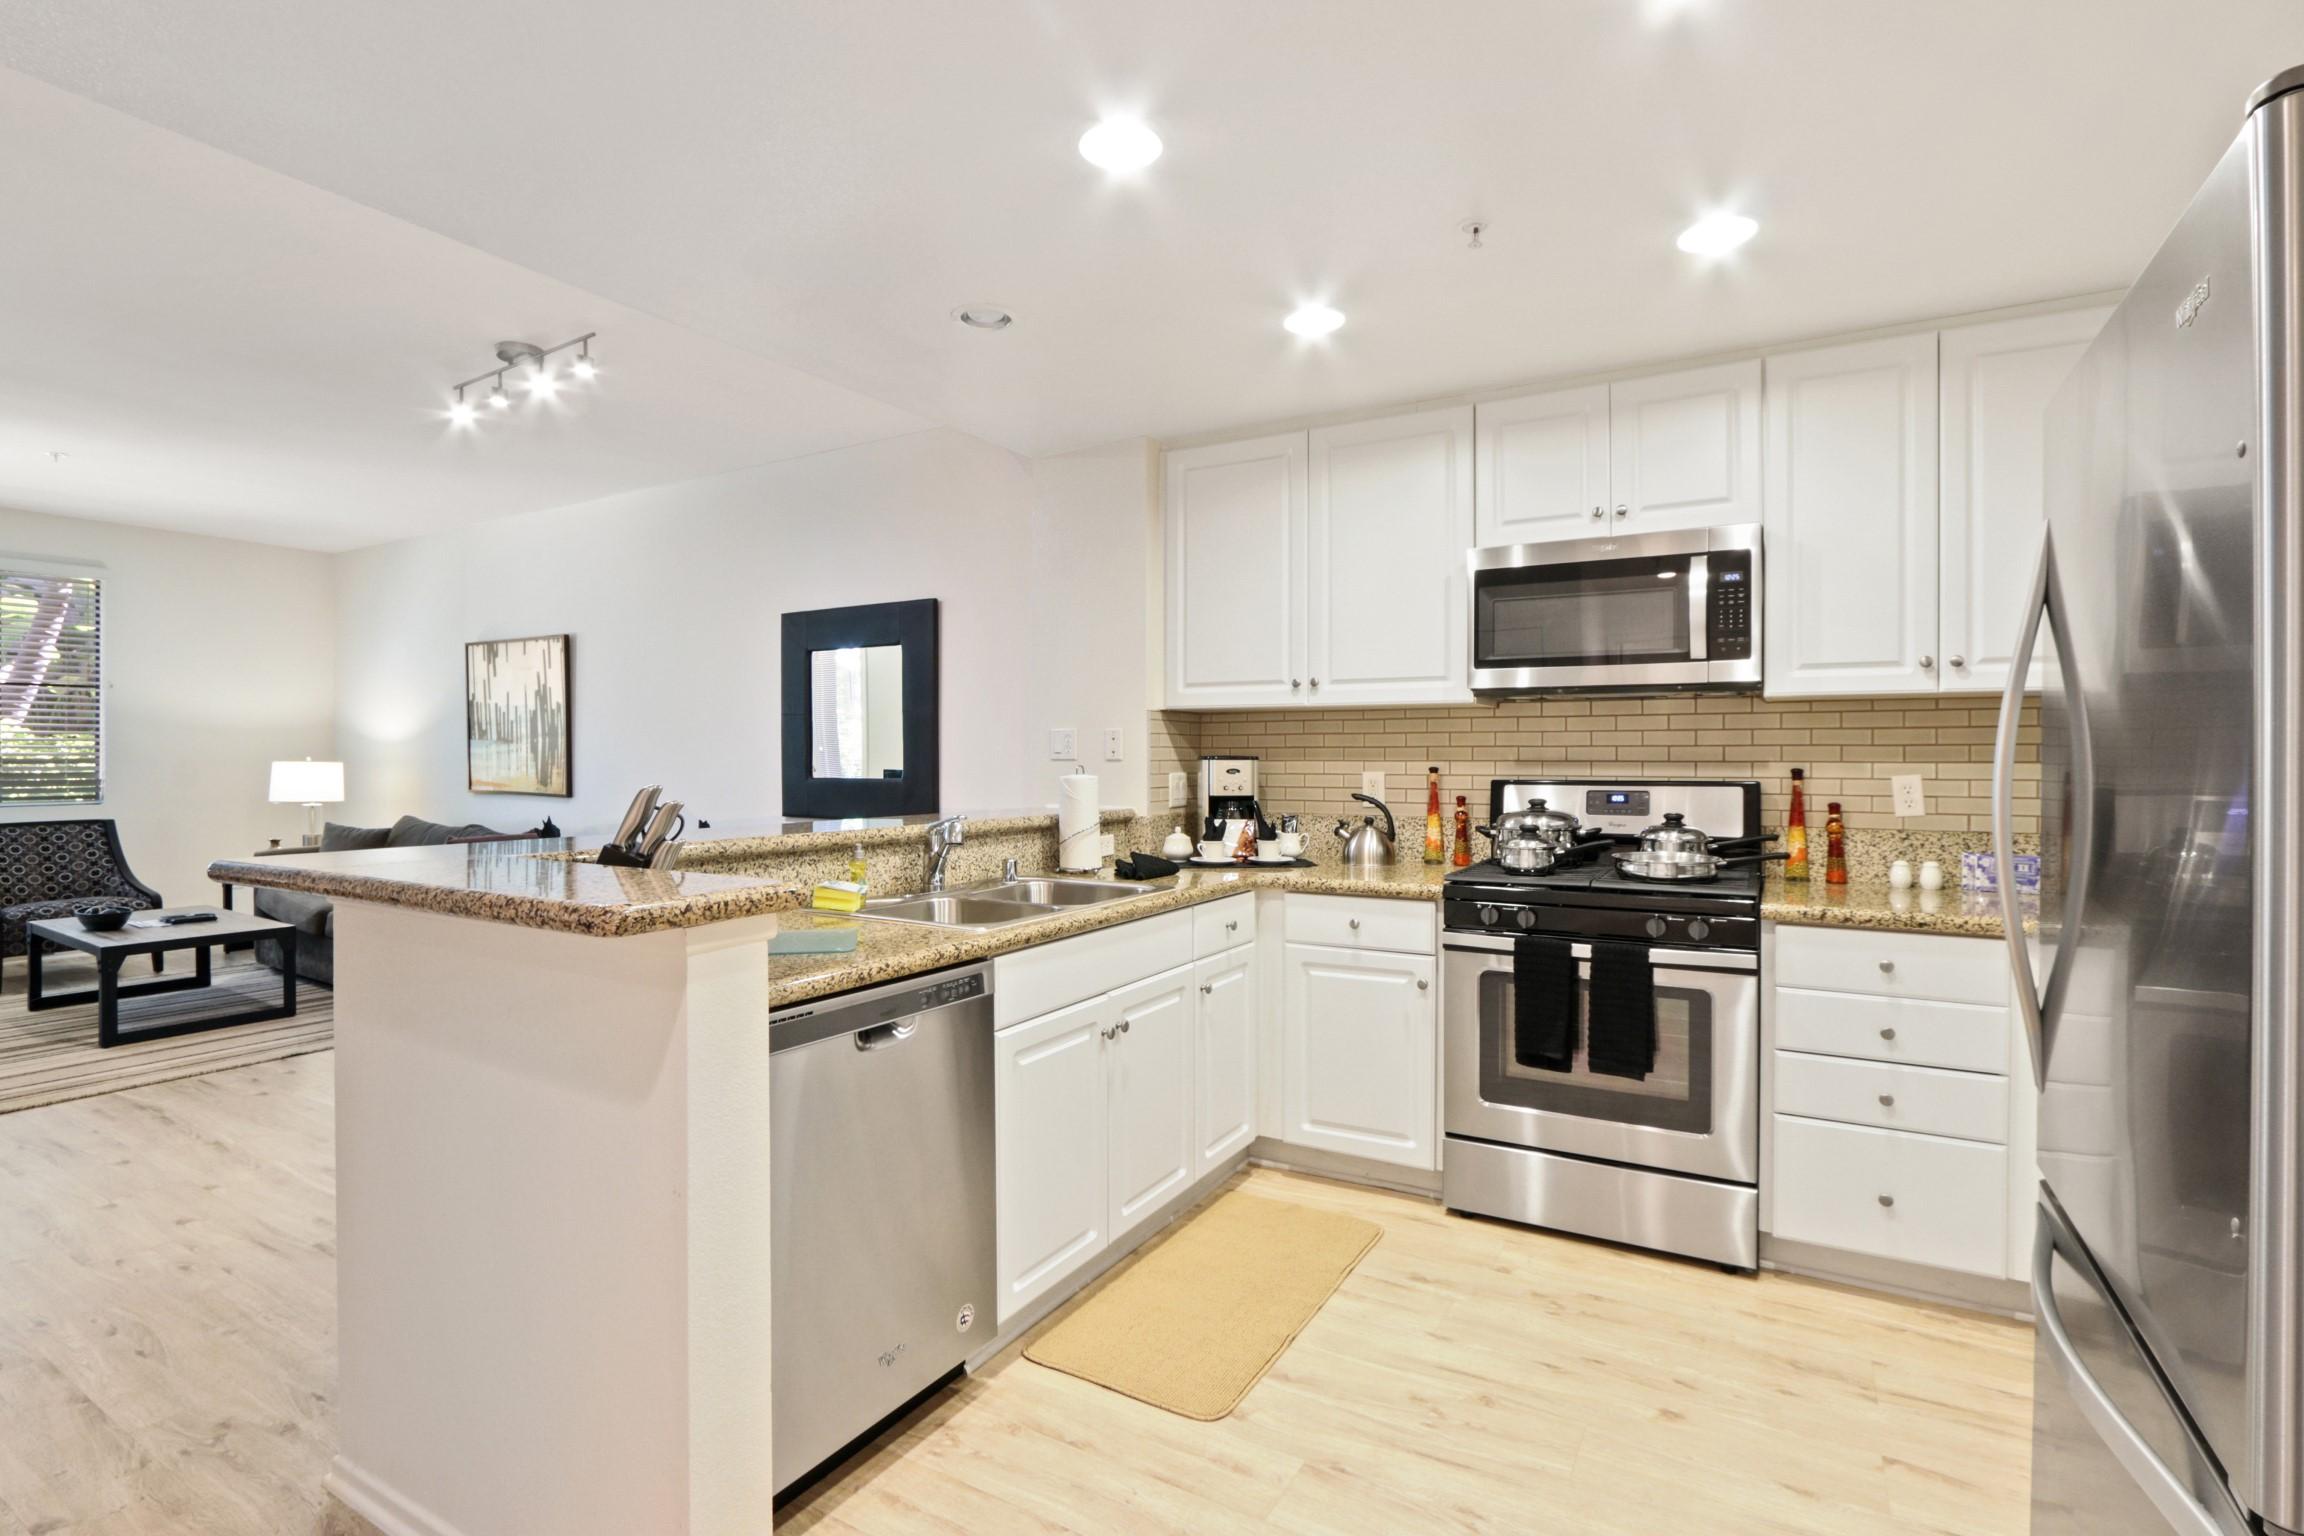 image 3 furnished 1 bedroom Apartment for rent in Irvine, Orange County